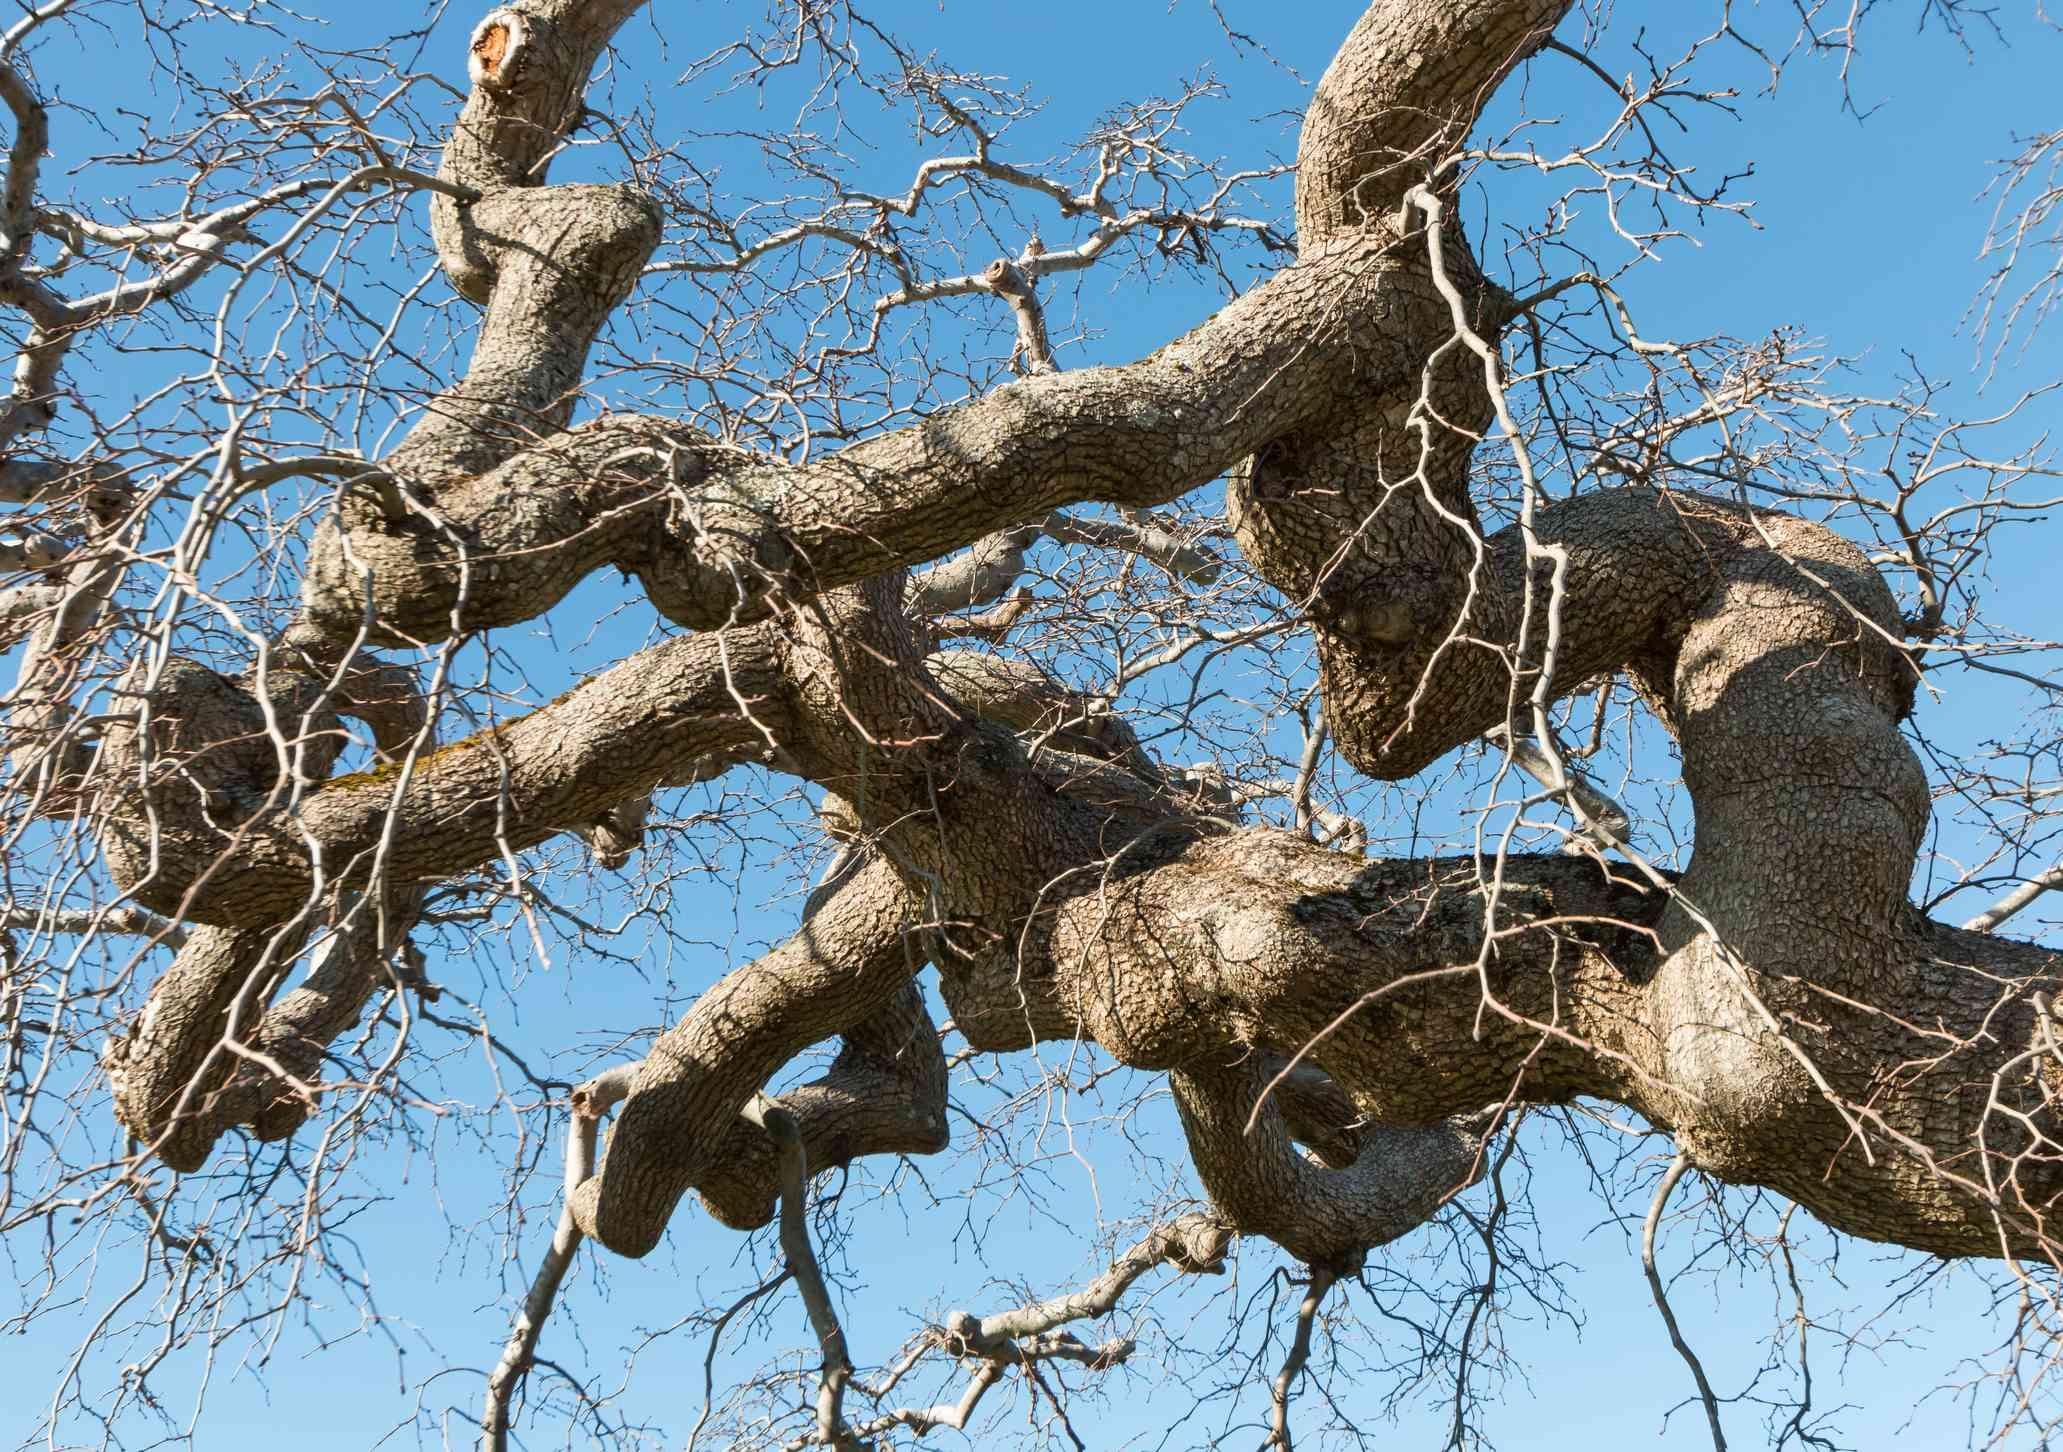 Twisted limbs of camperdown elm tree in winter